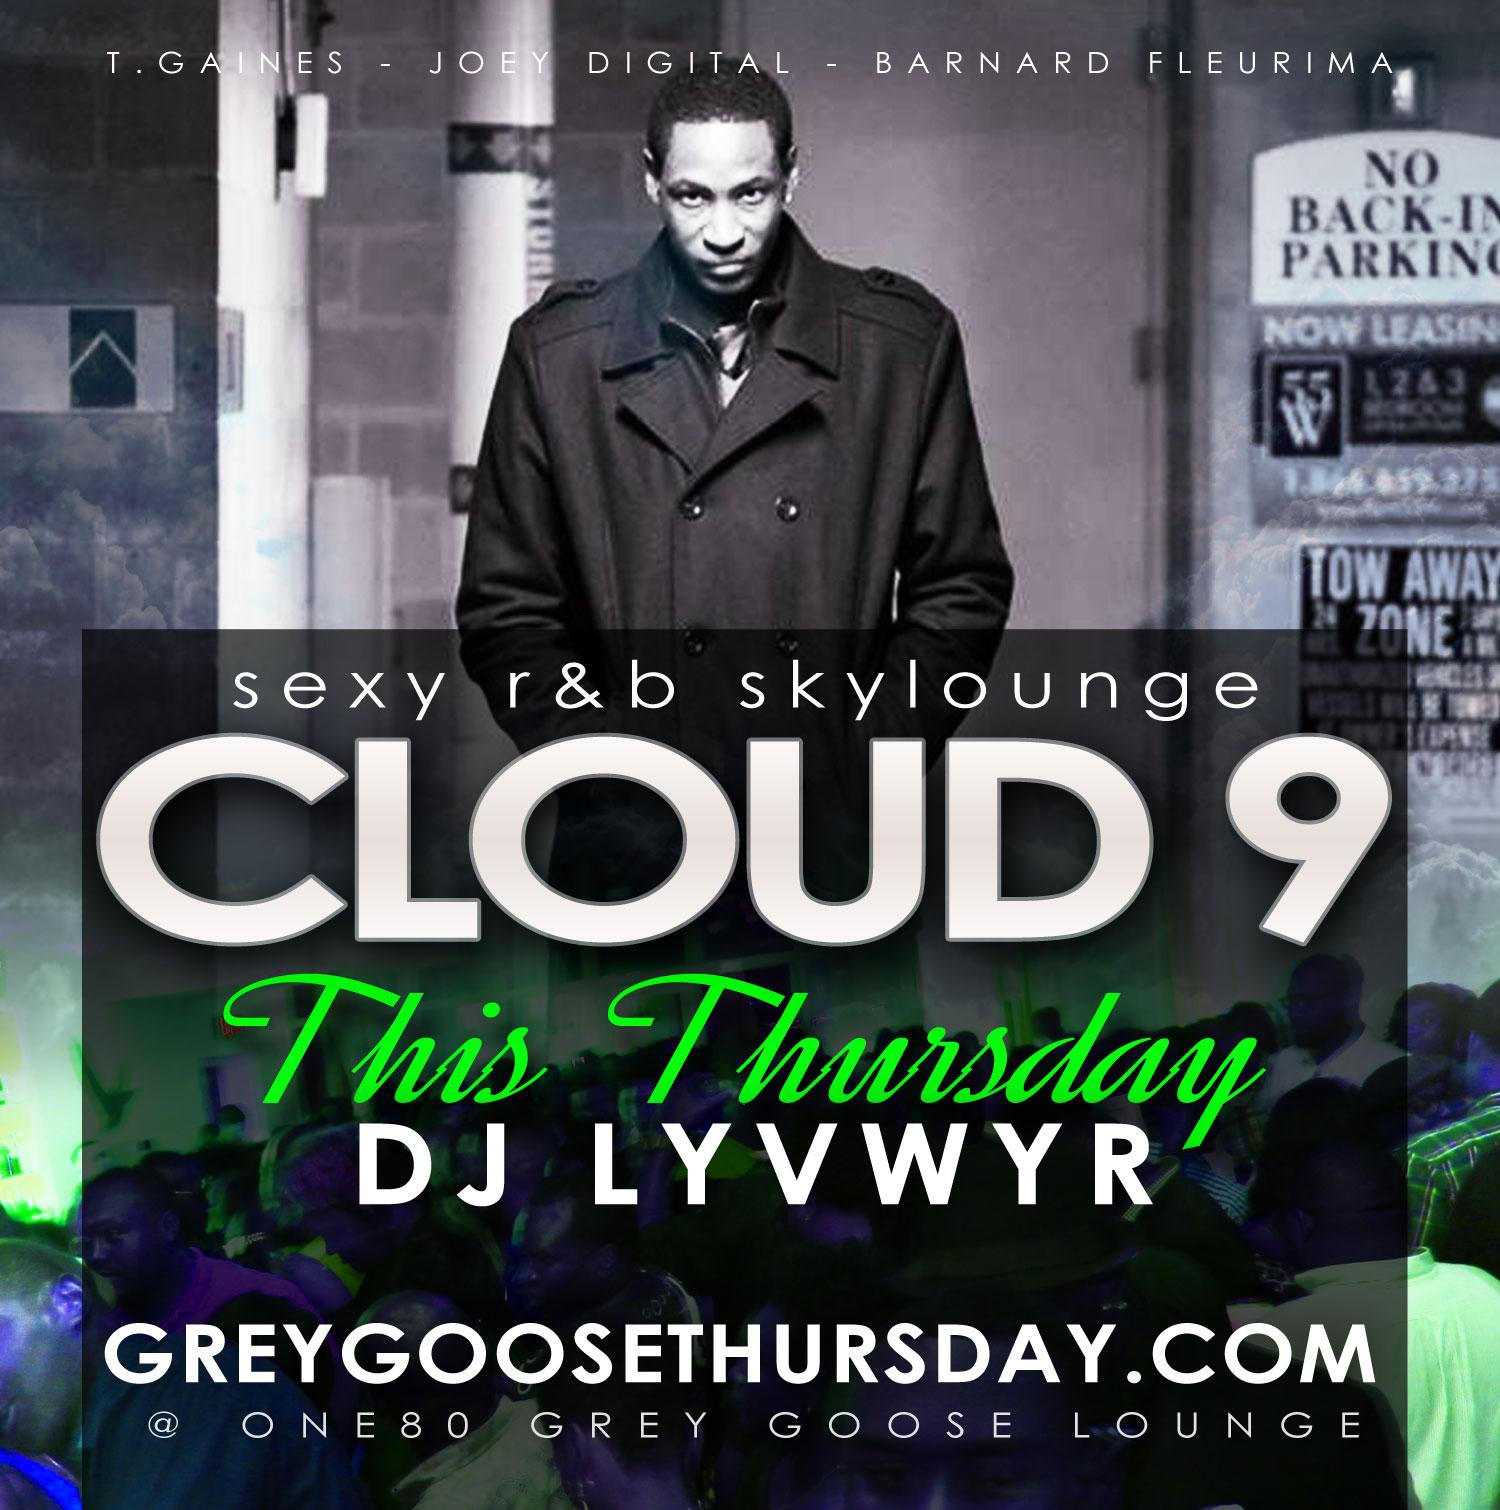 2014-08-21_Cloud9_Lyvwyr_Generic